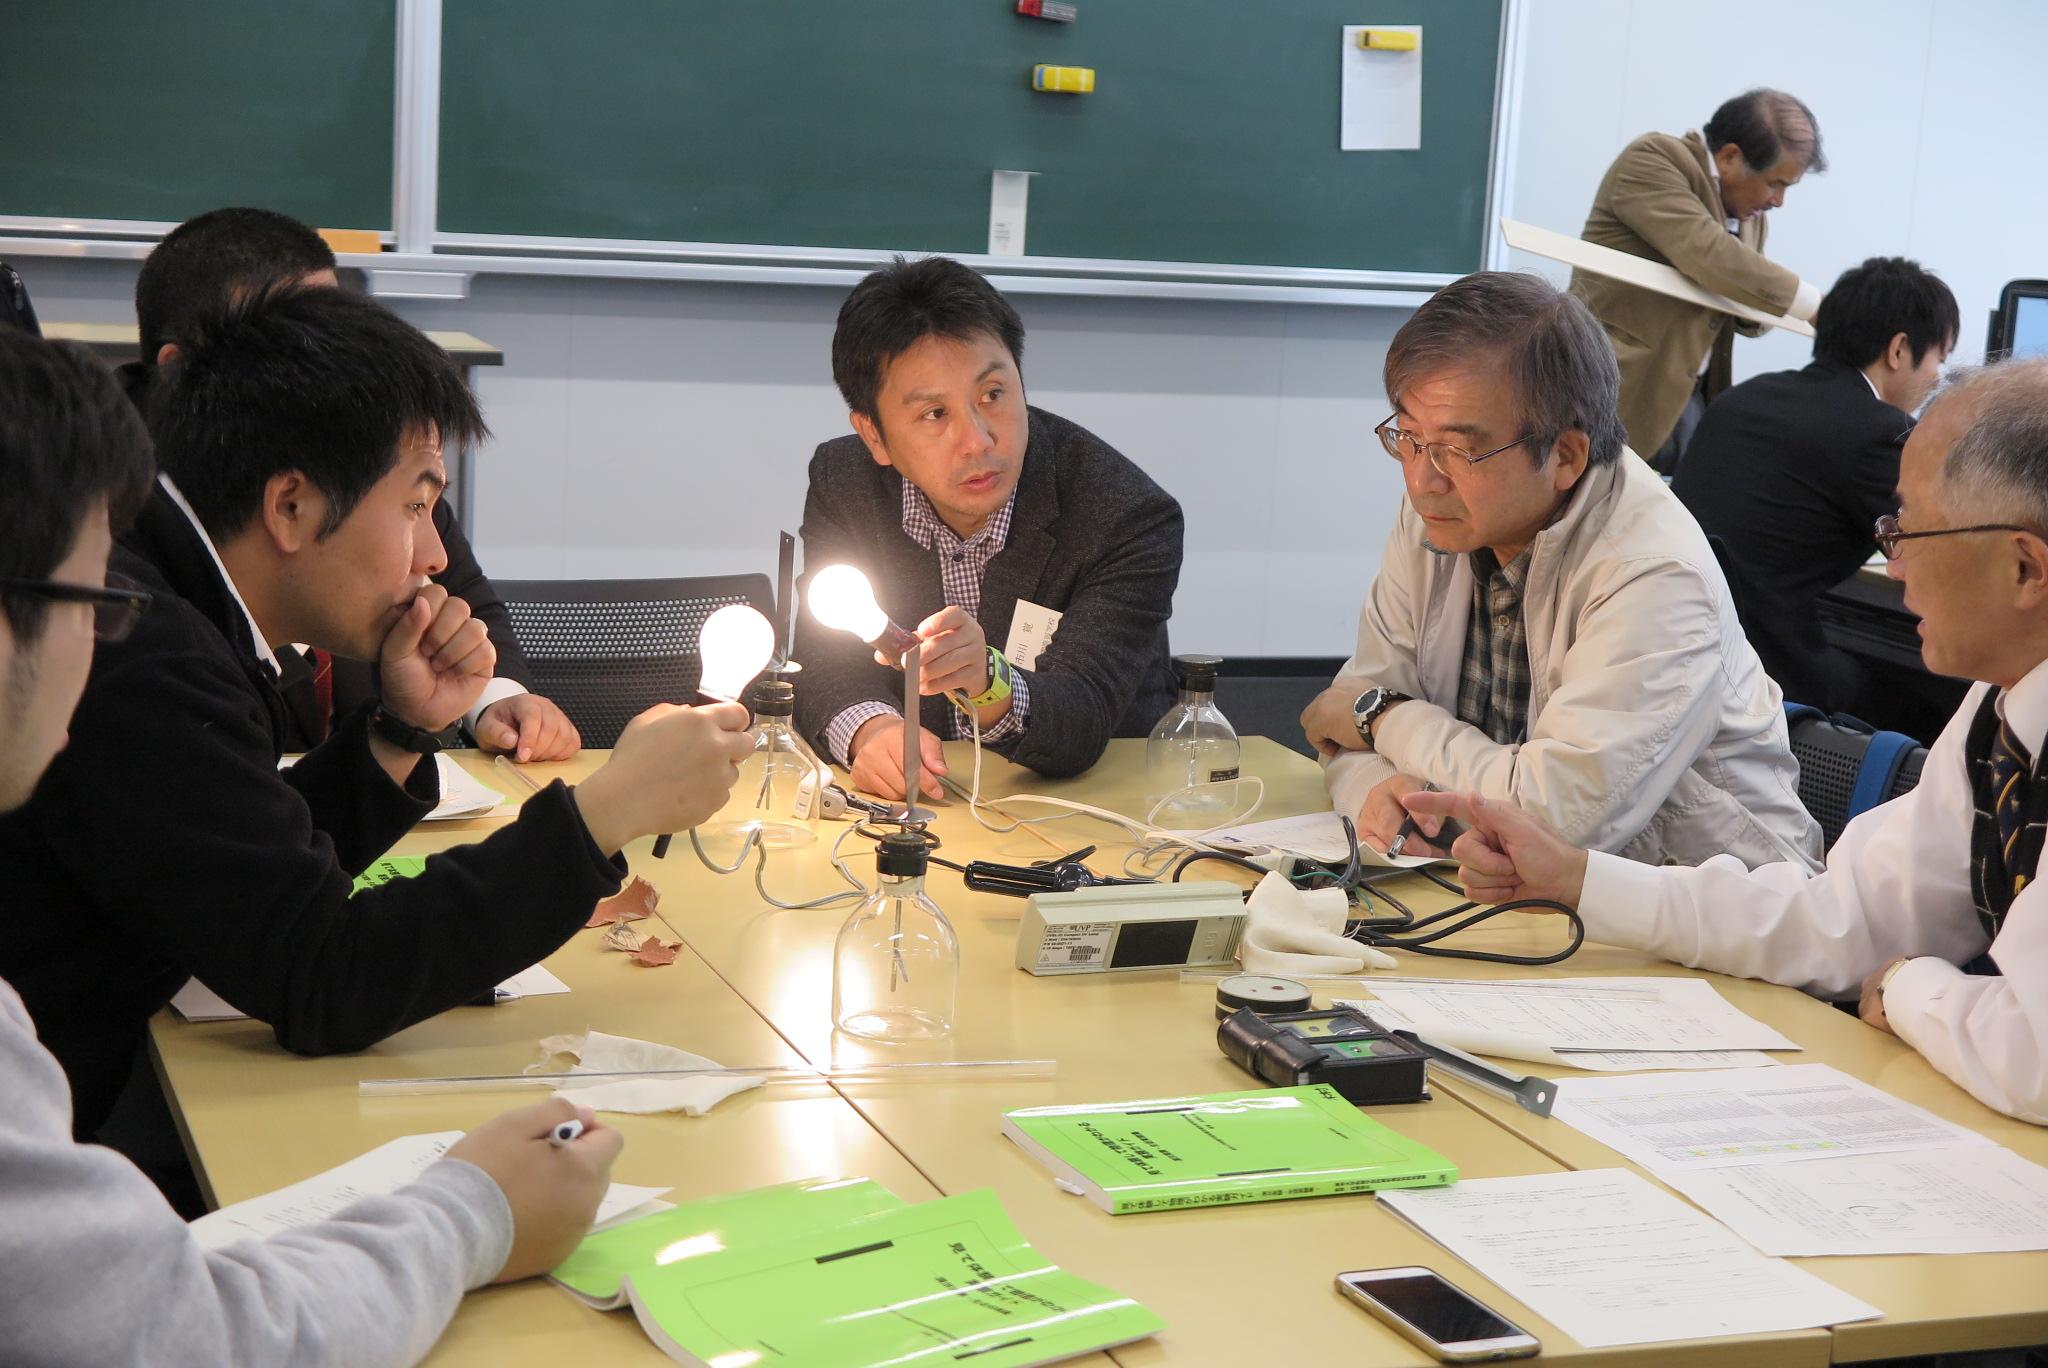 http://www.kurume-it.ac.jp/news/pdf/IMG_8923.JPG